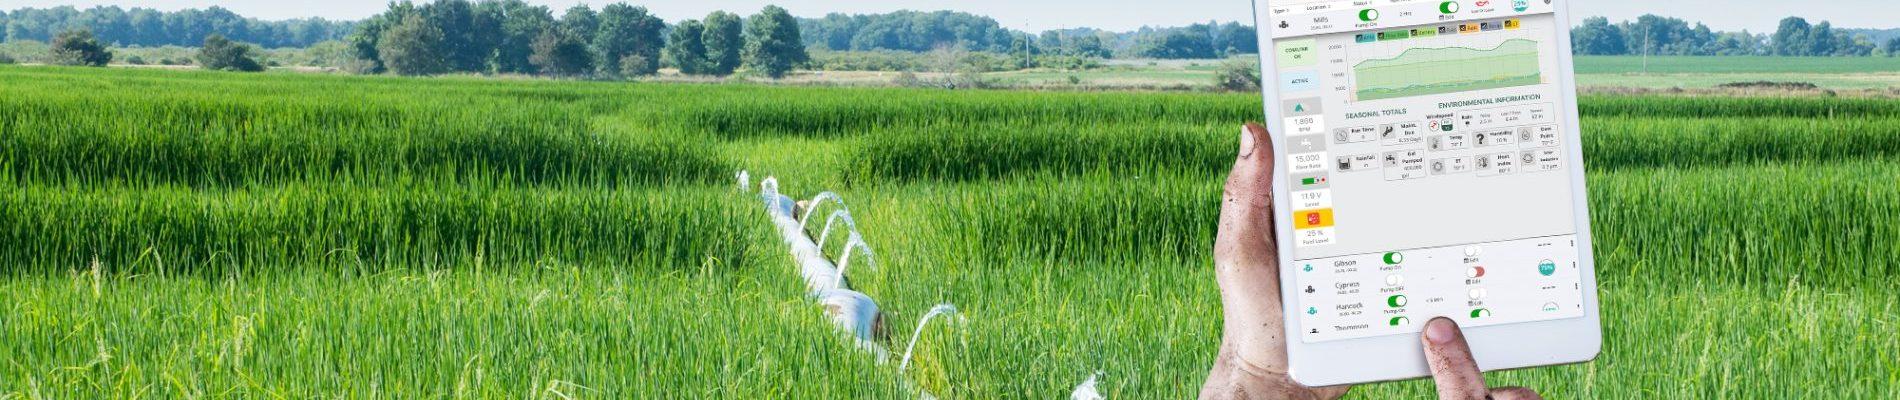 Smart Farm Portal